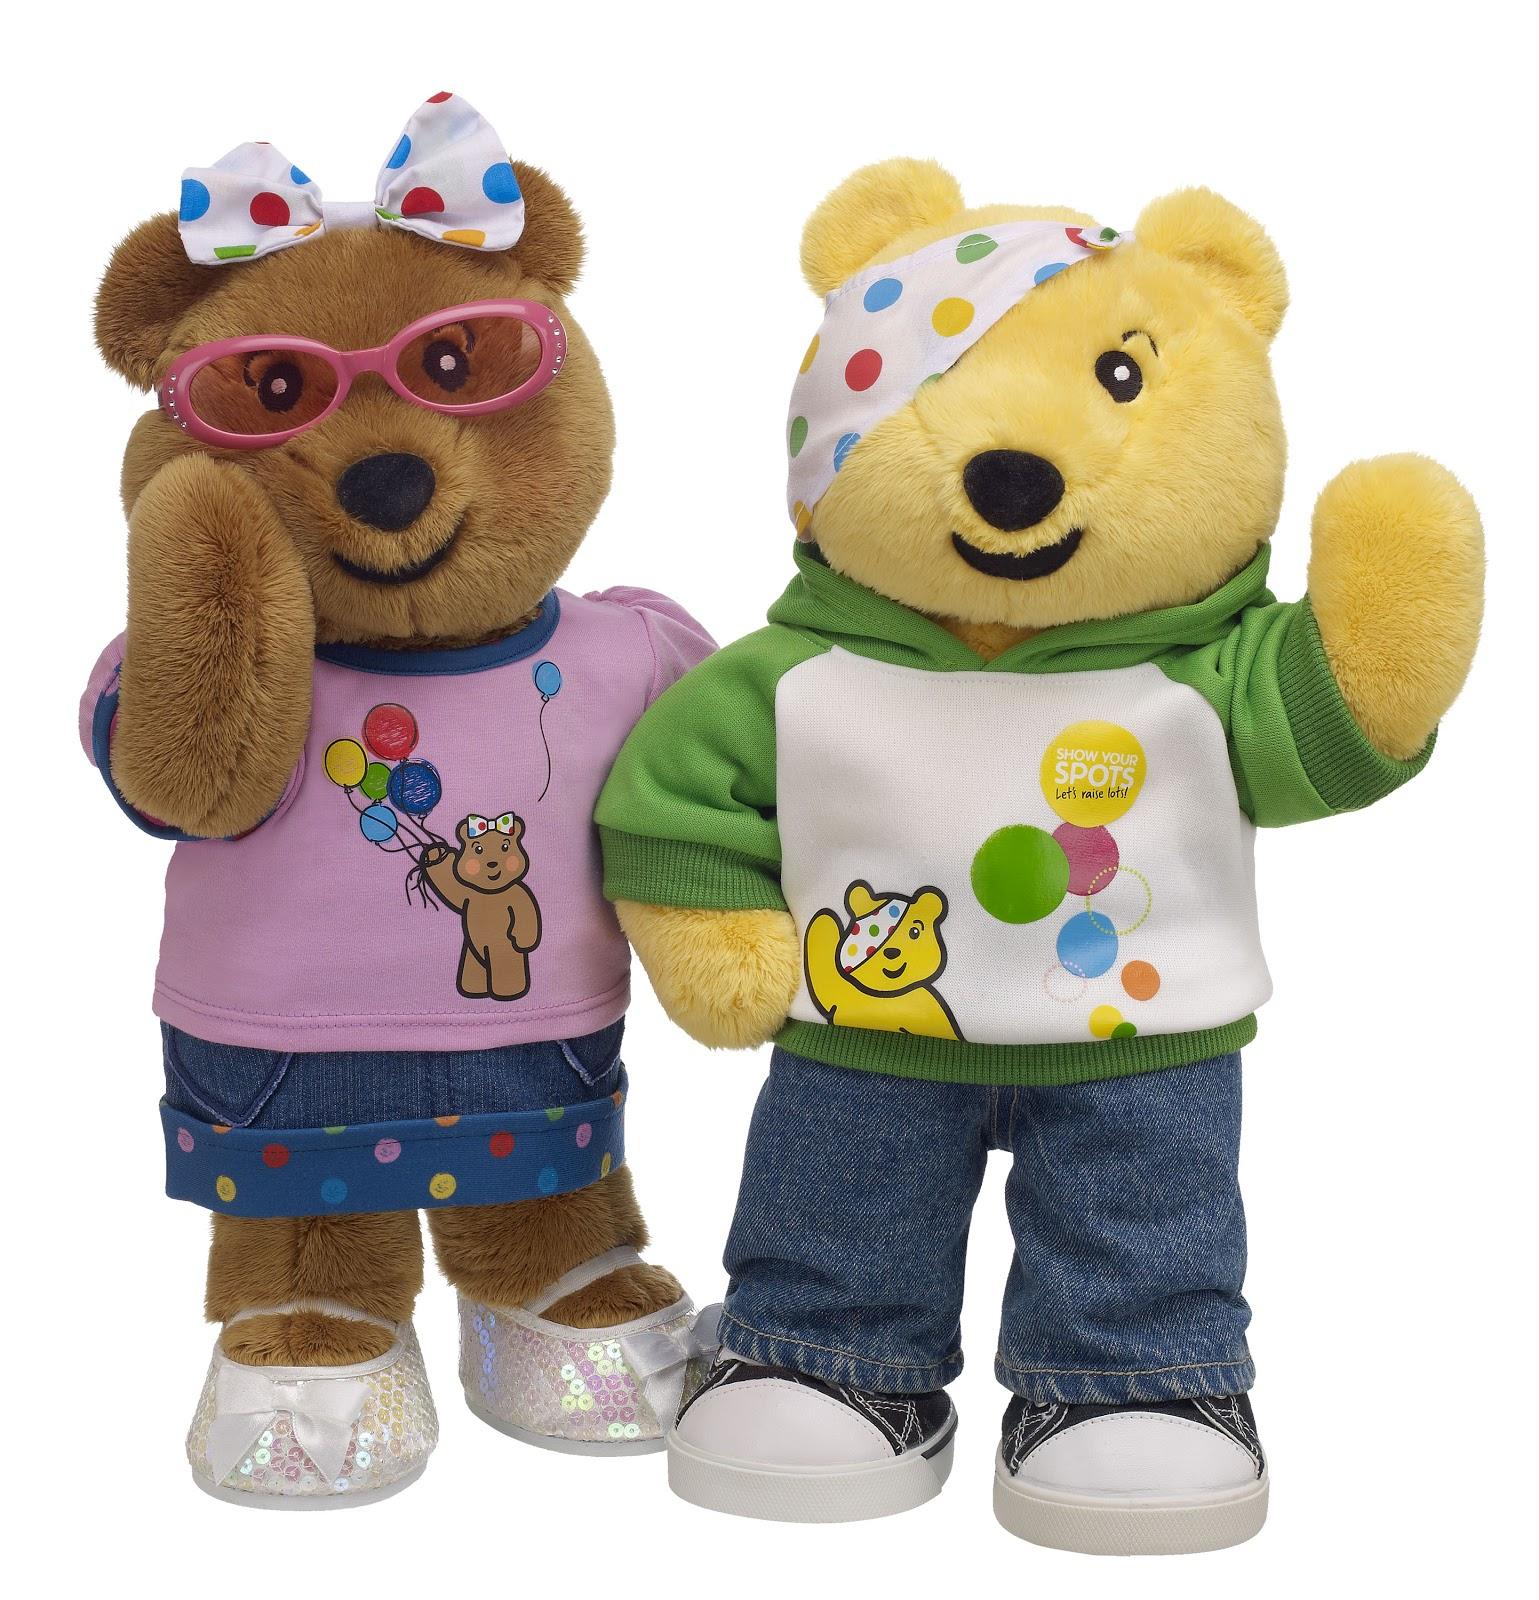 Build A Bear Shoes For Sale